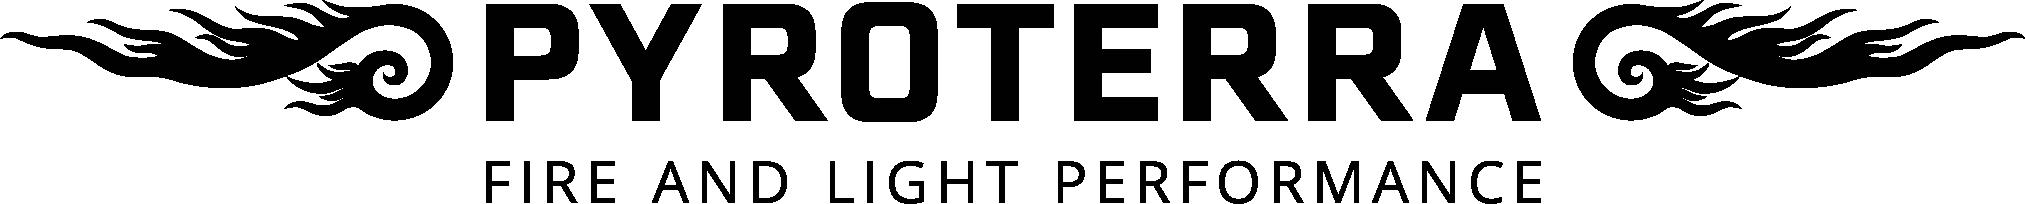 Pyroterra_logo_with_subtext